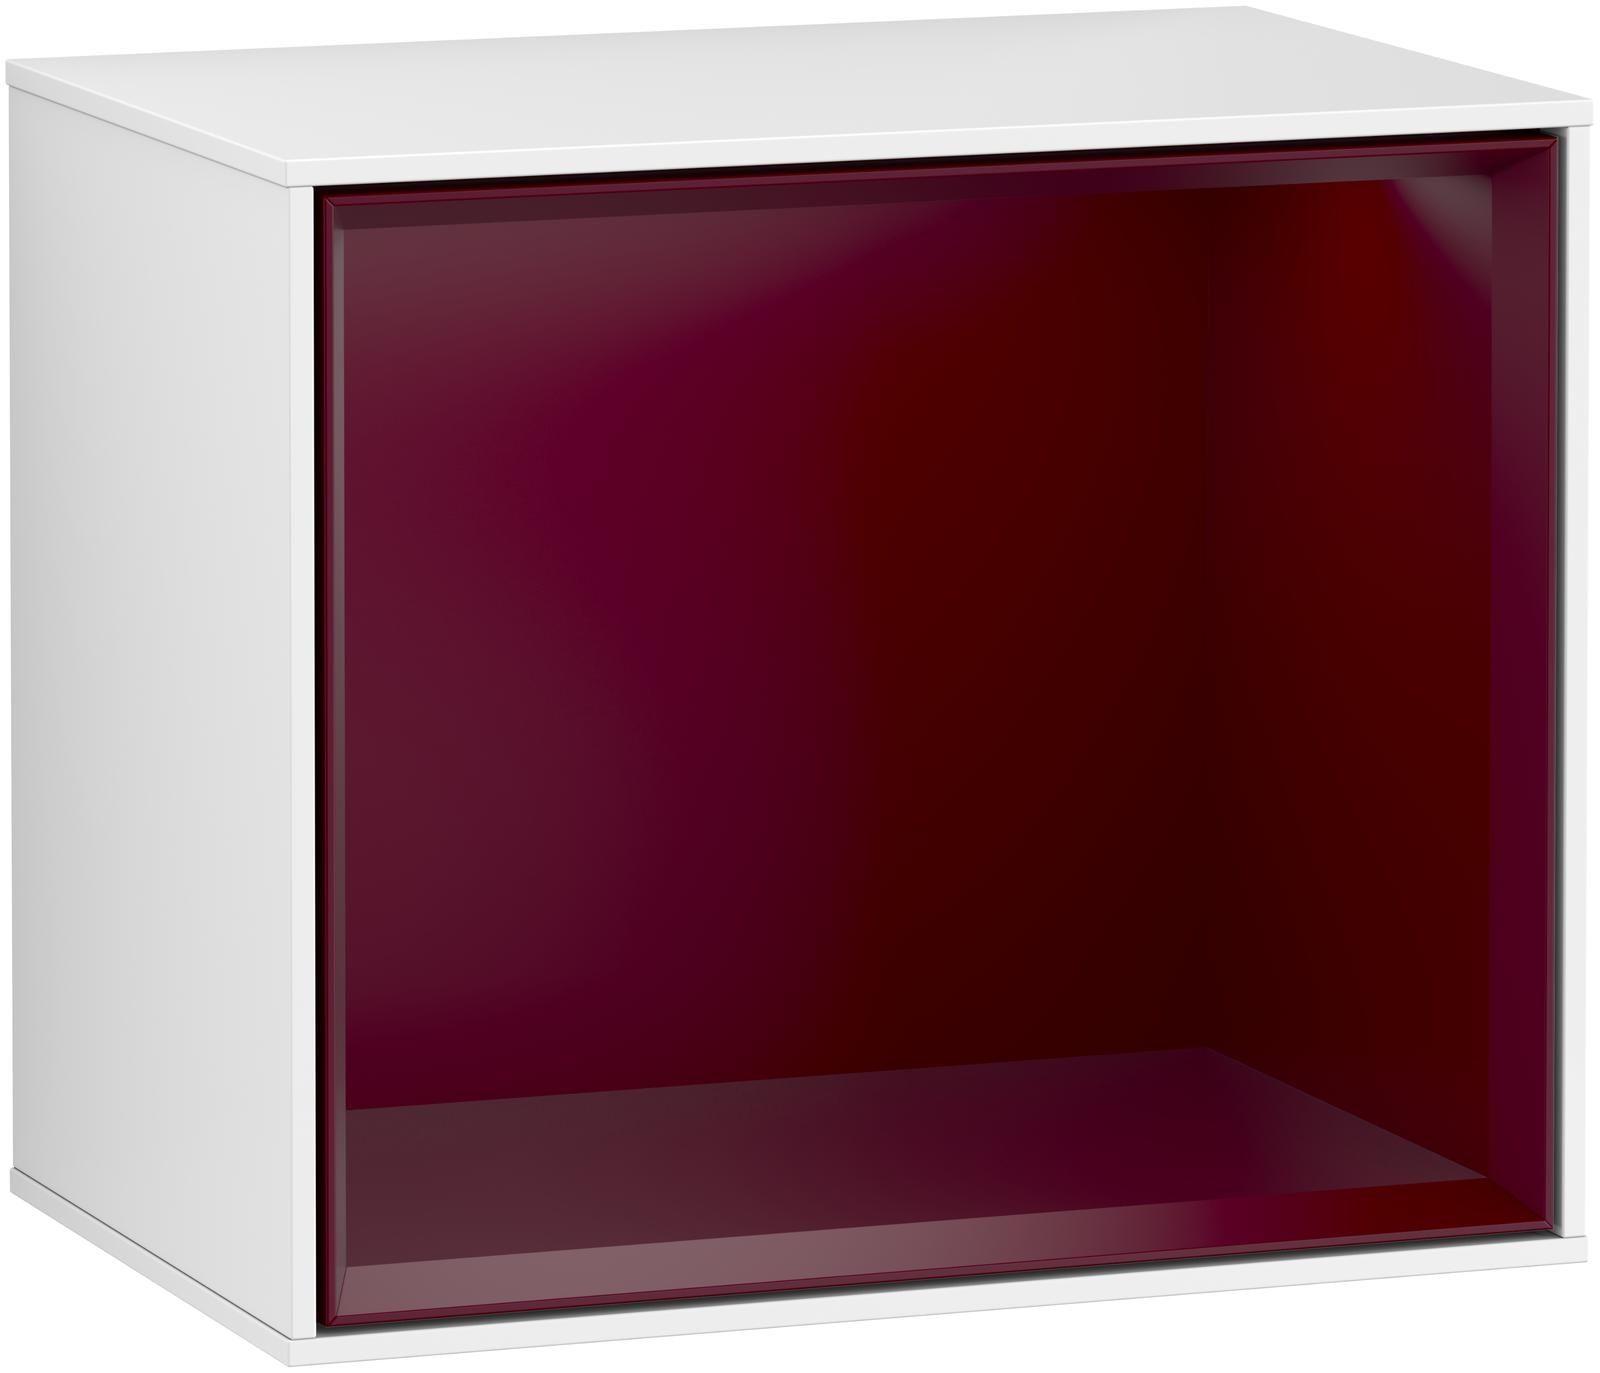 Villeroy & Boch Finion F59 Regalmodul LED-Beleuchtung B:41,8xH:35,6xT:27cm Front, Korpus: Glossy White Lack, Regal: Peony F590HBGF